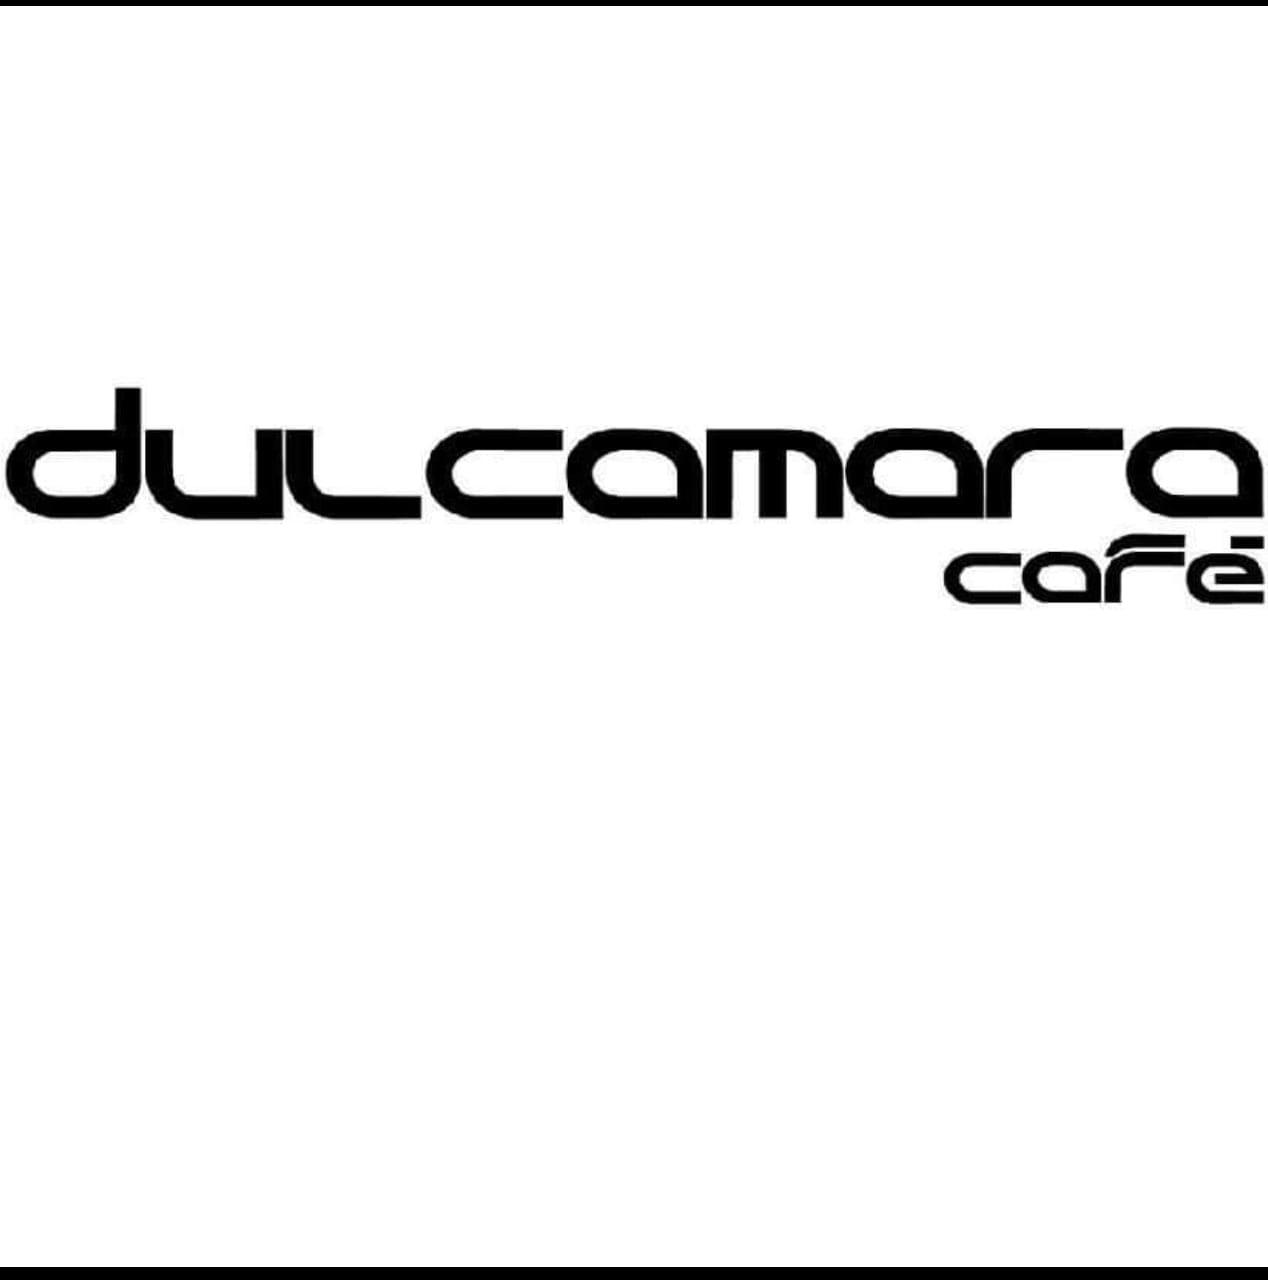 DULCAMARA CAFE  BAR E CAFFETTERIA - 1